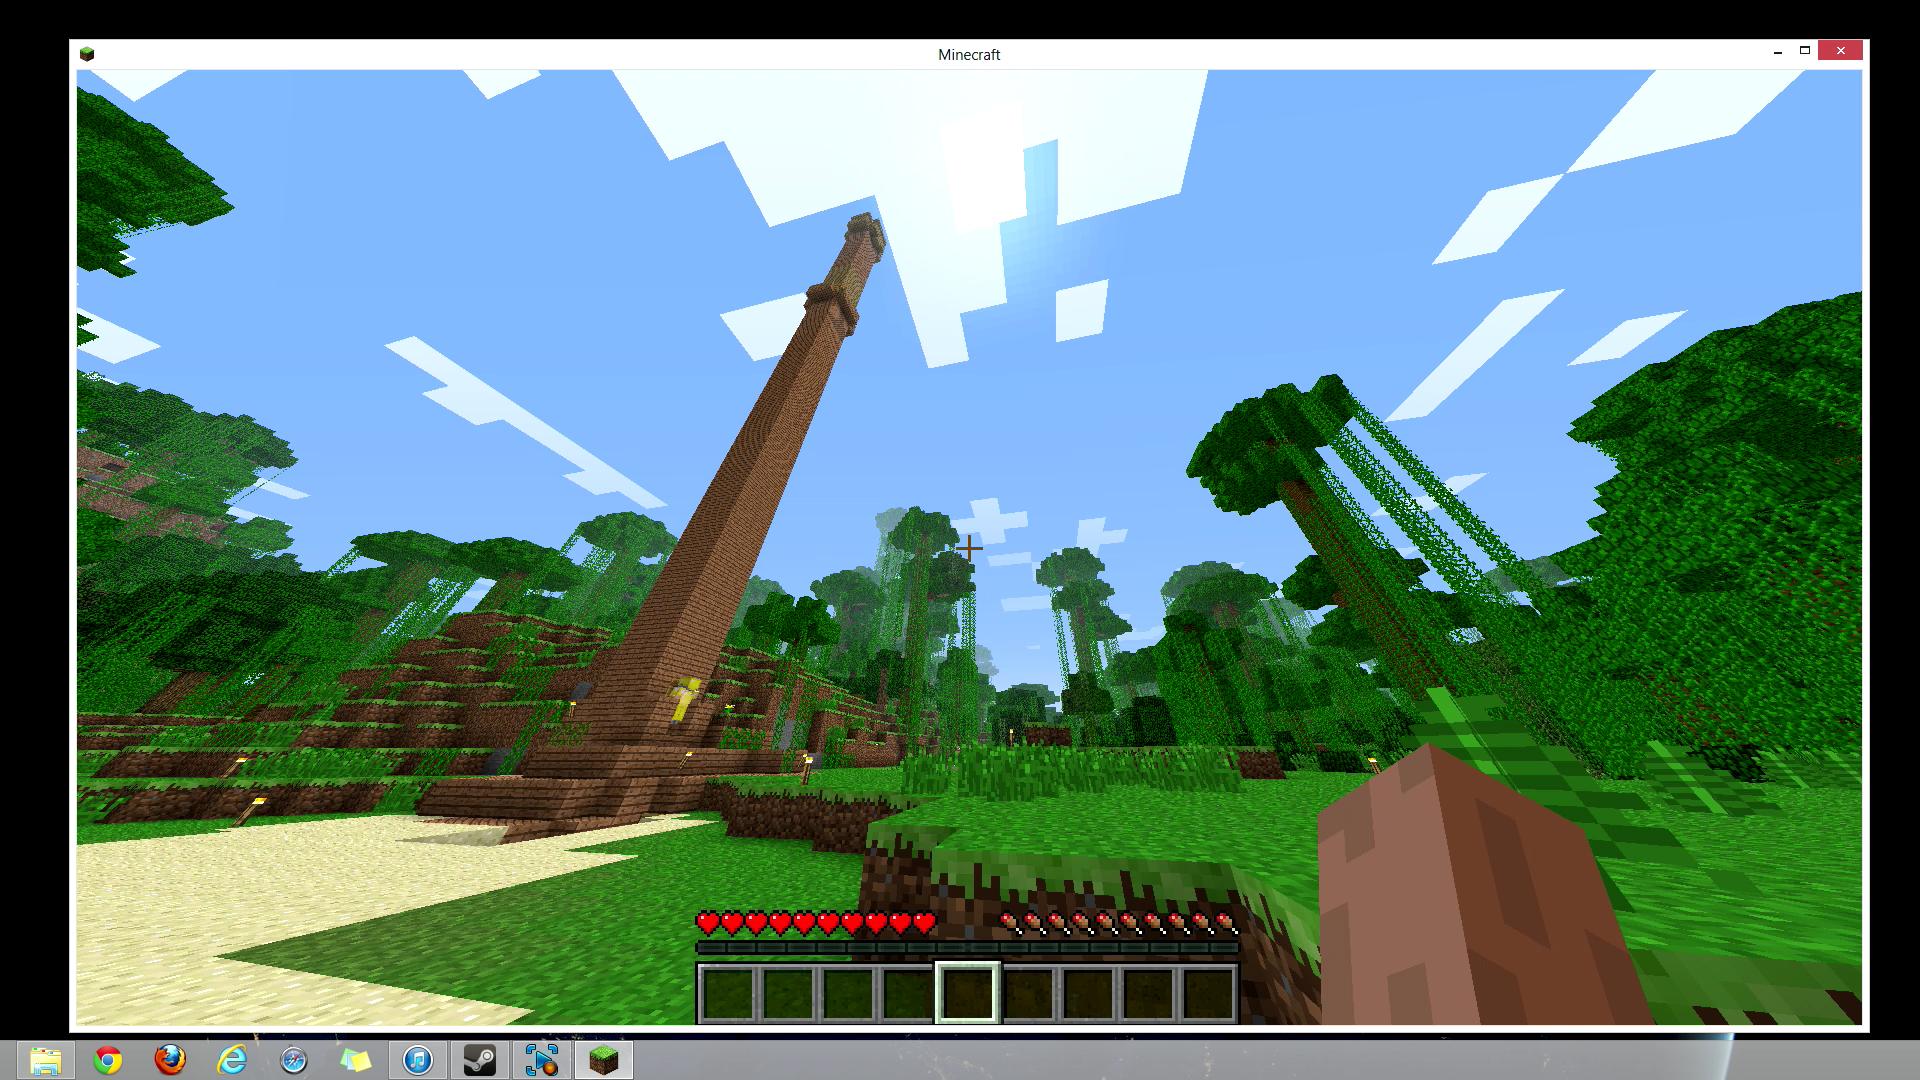 minecraft - 1 - 2013-06-08 02-12-45